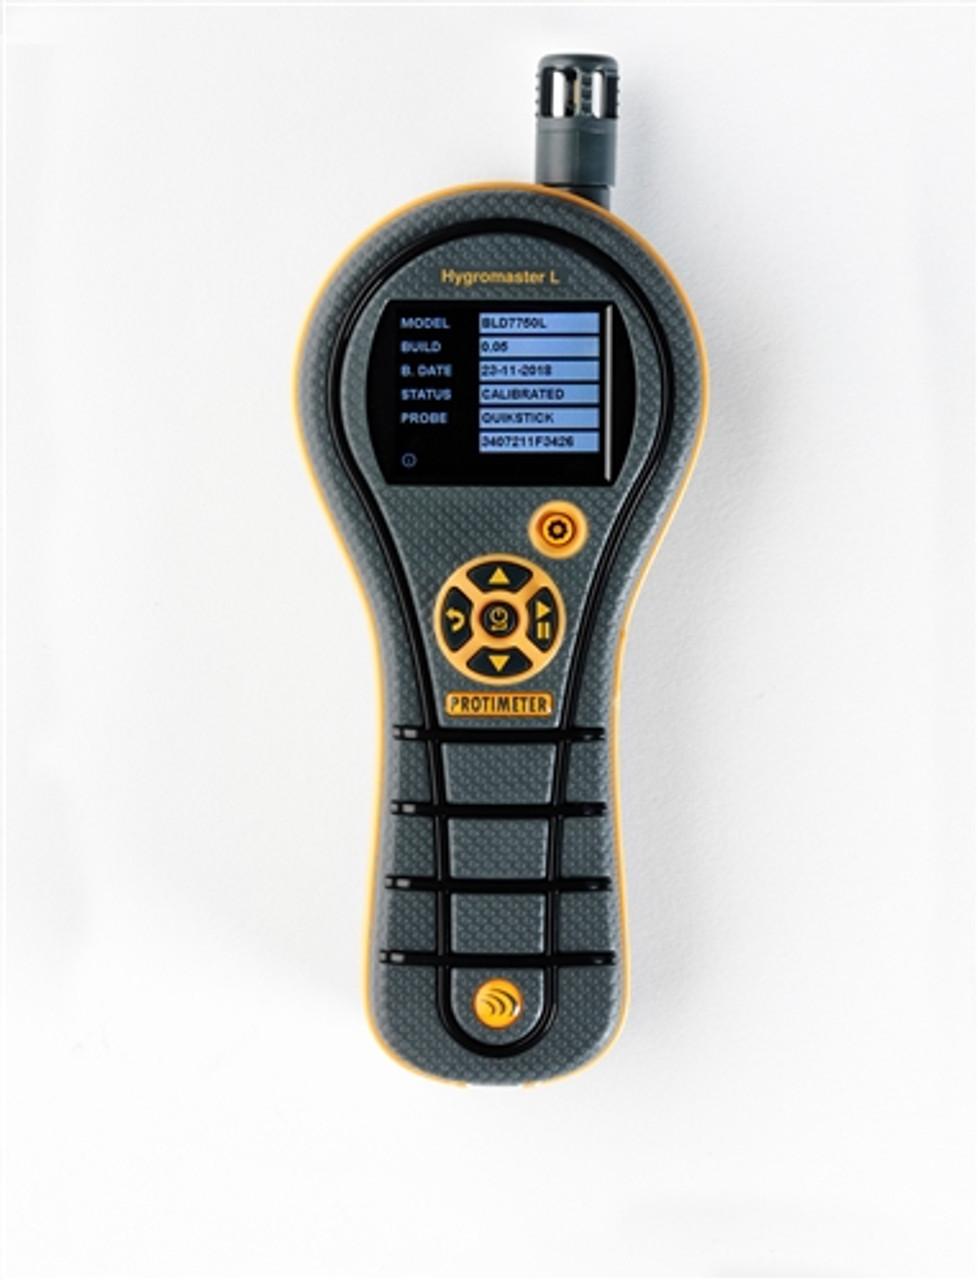 Protimeter Hygromaster L with short QuickStick - BLD7751L